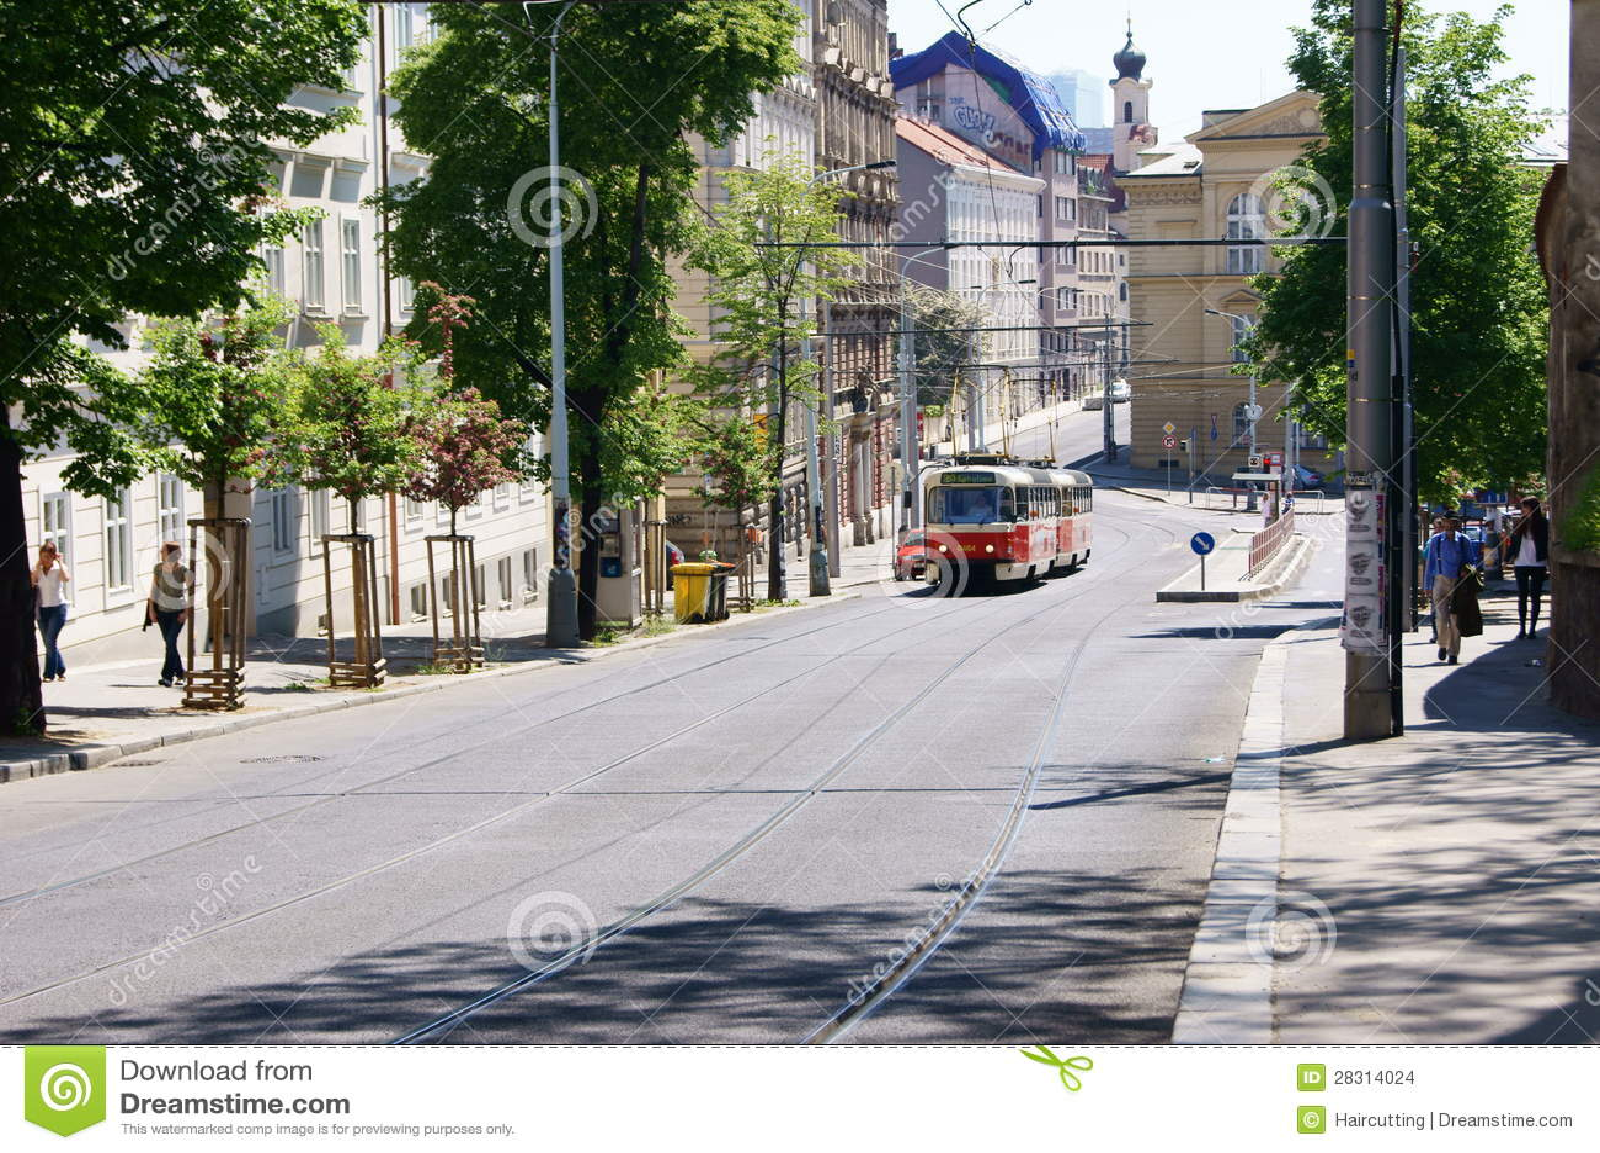 old tram prague street - photo #34